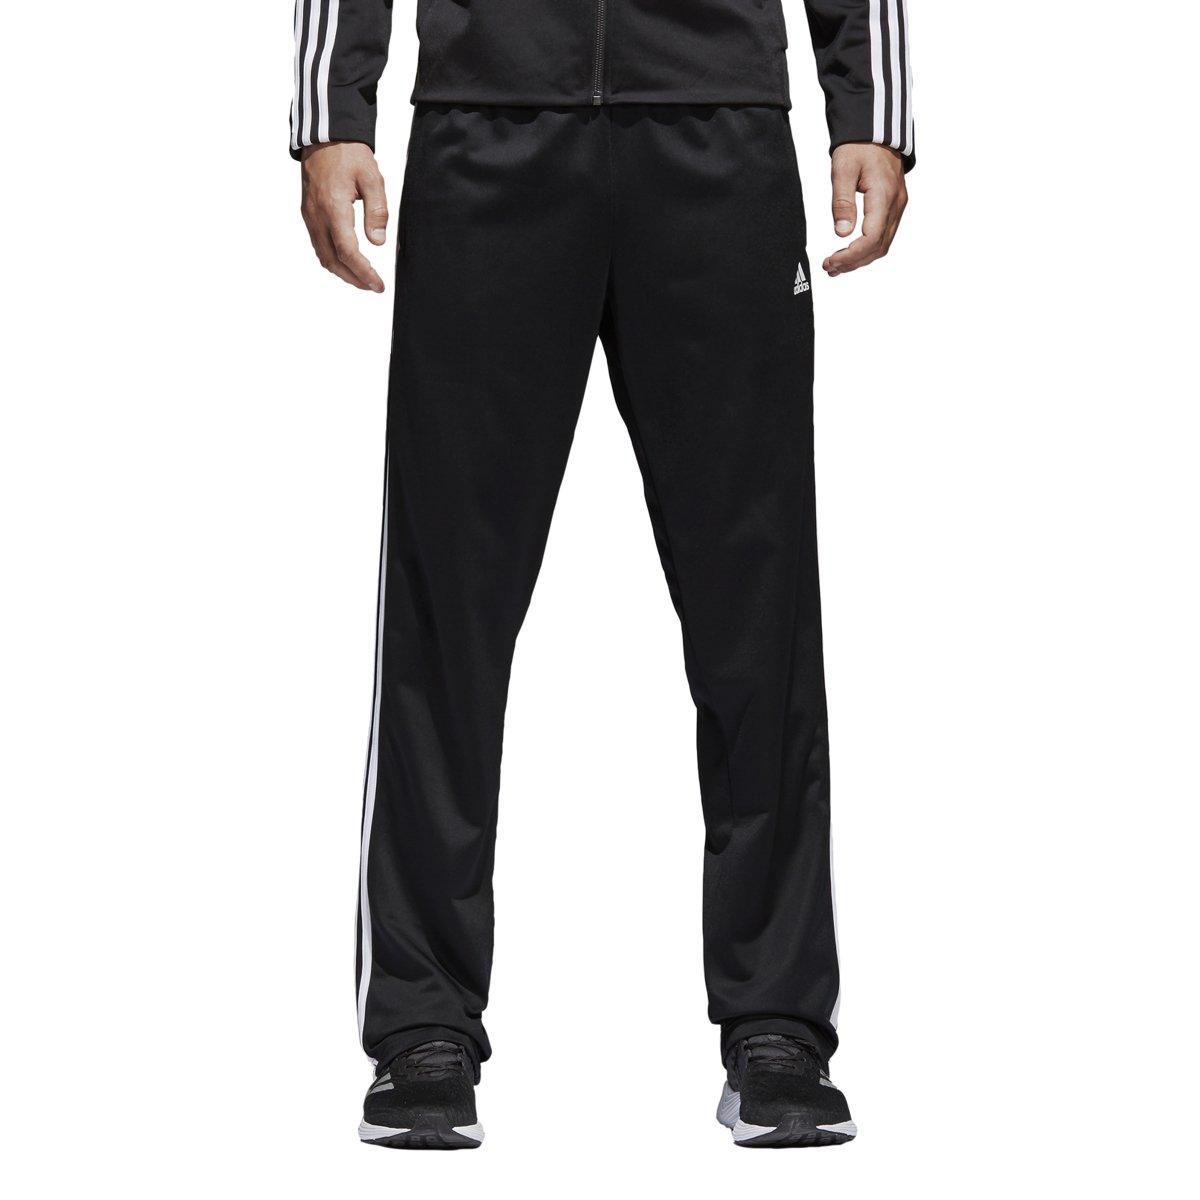 89fca22af Galleon - Adidas Men's Big & Tall Essentials 3-Stripes Regular Fit Tricot  Pants Black/White 1 XXXX-Large 34 Tall 34